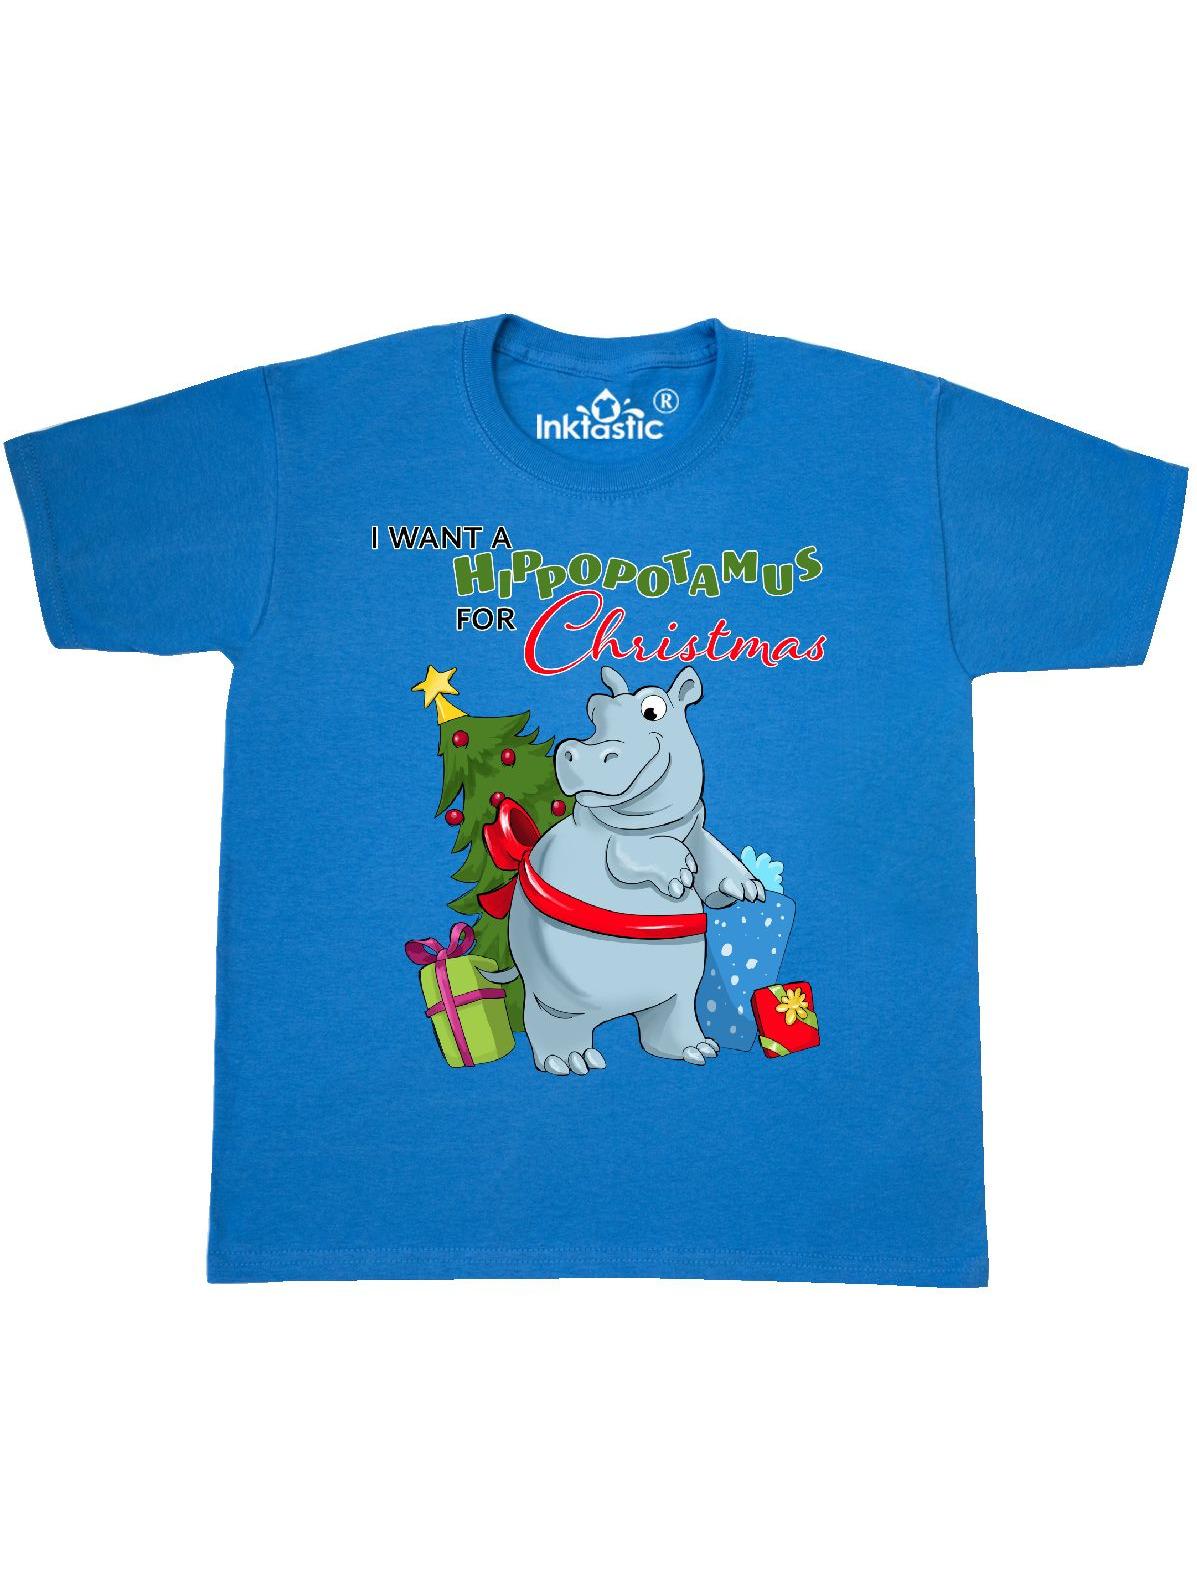 I Want a Hippopotamus for Christmas Youth T-Shirt